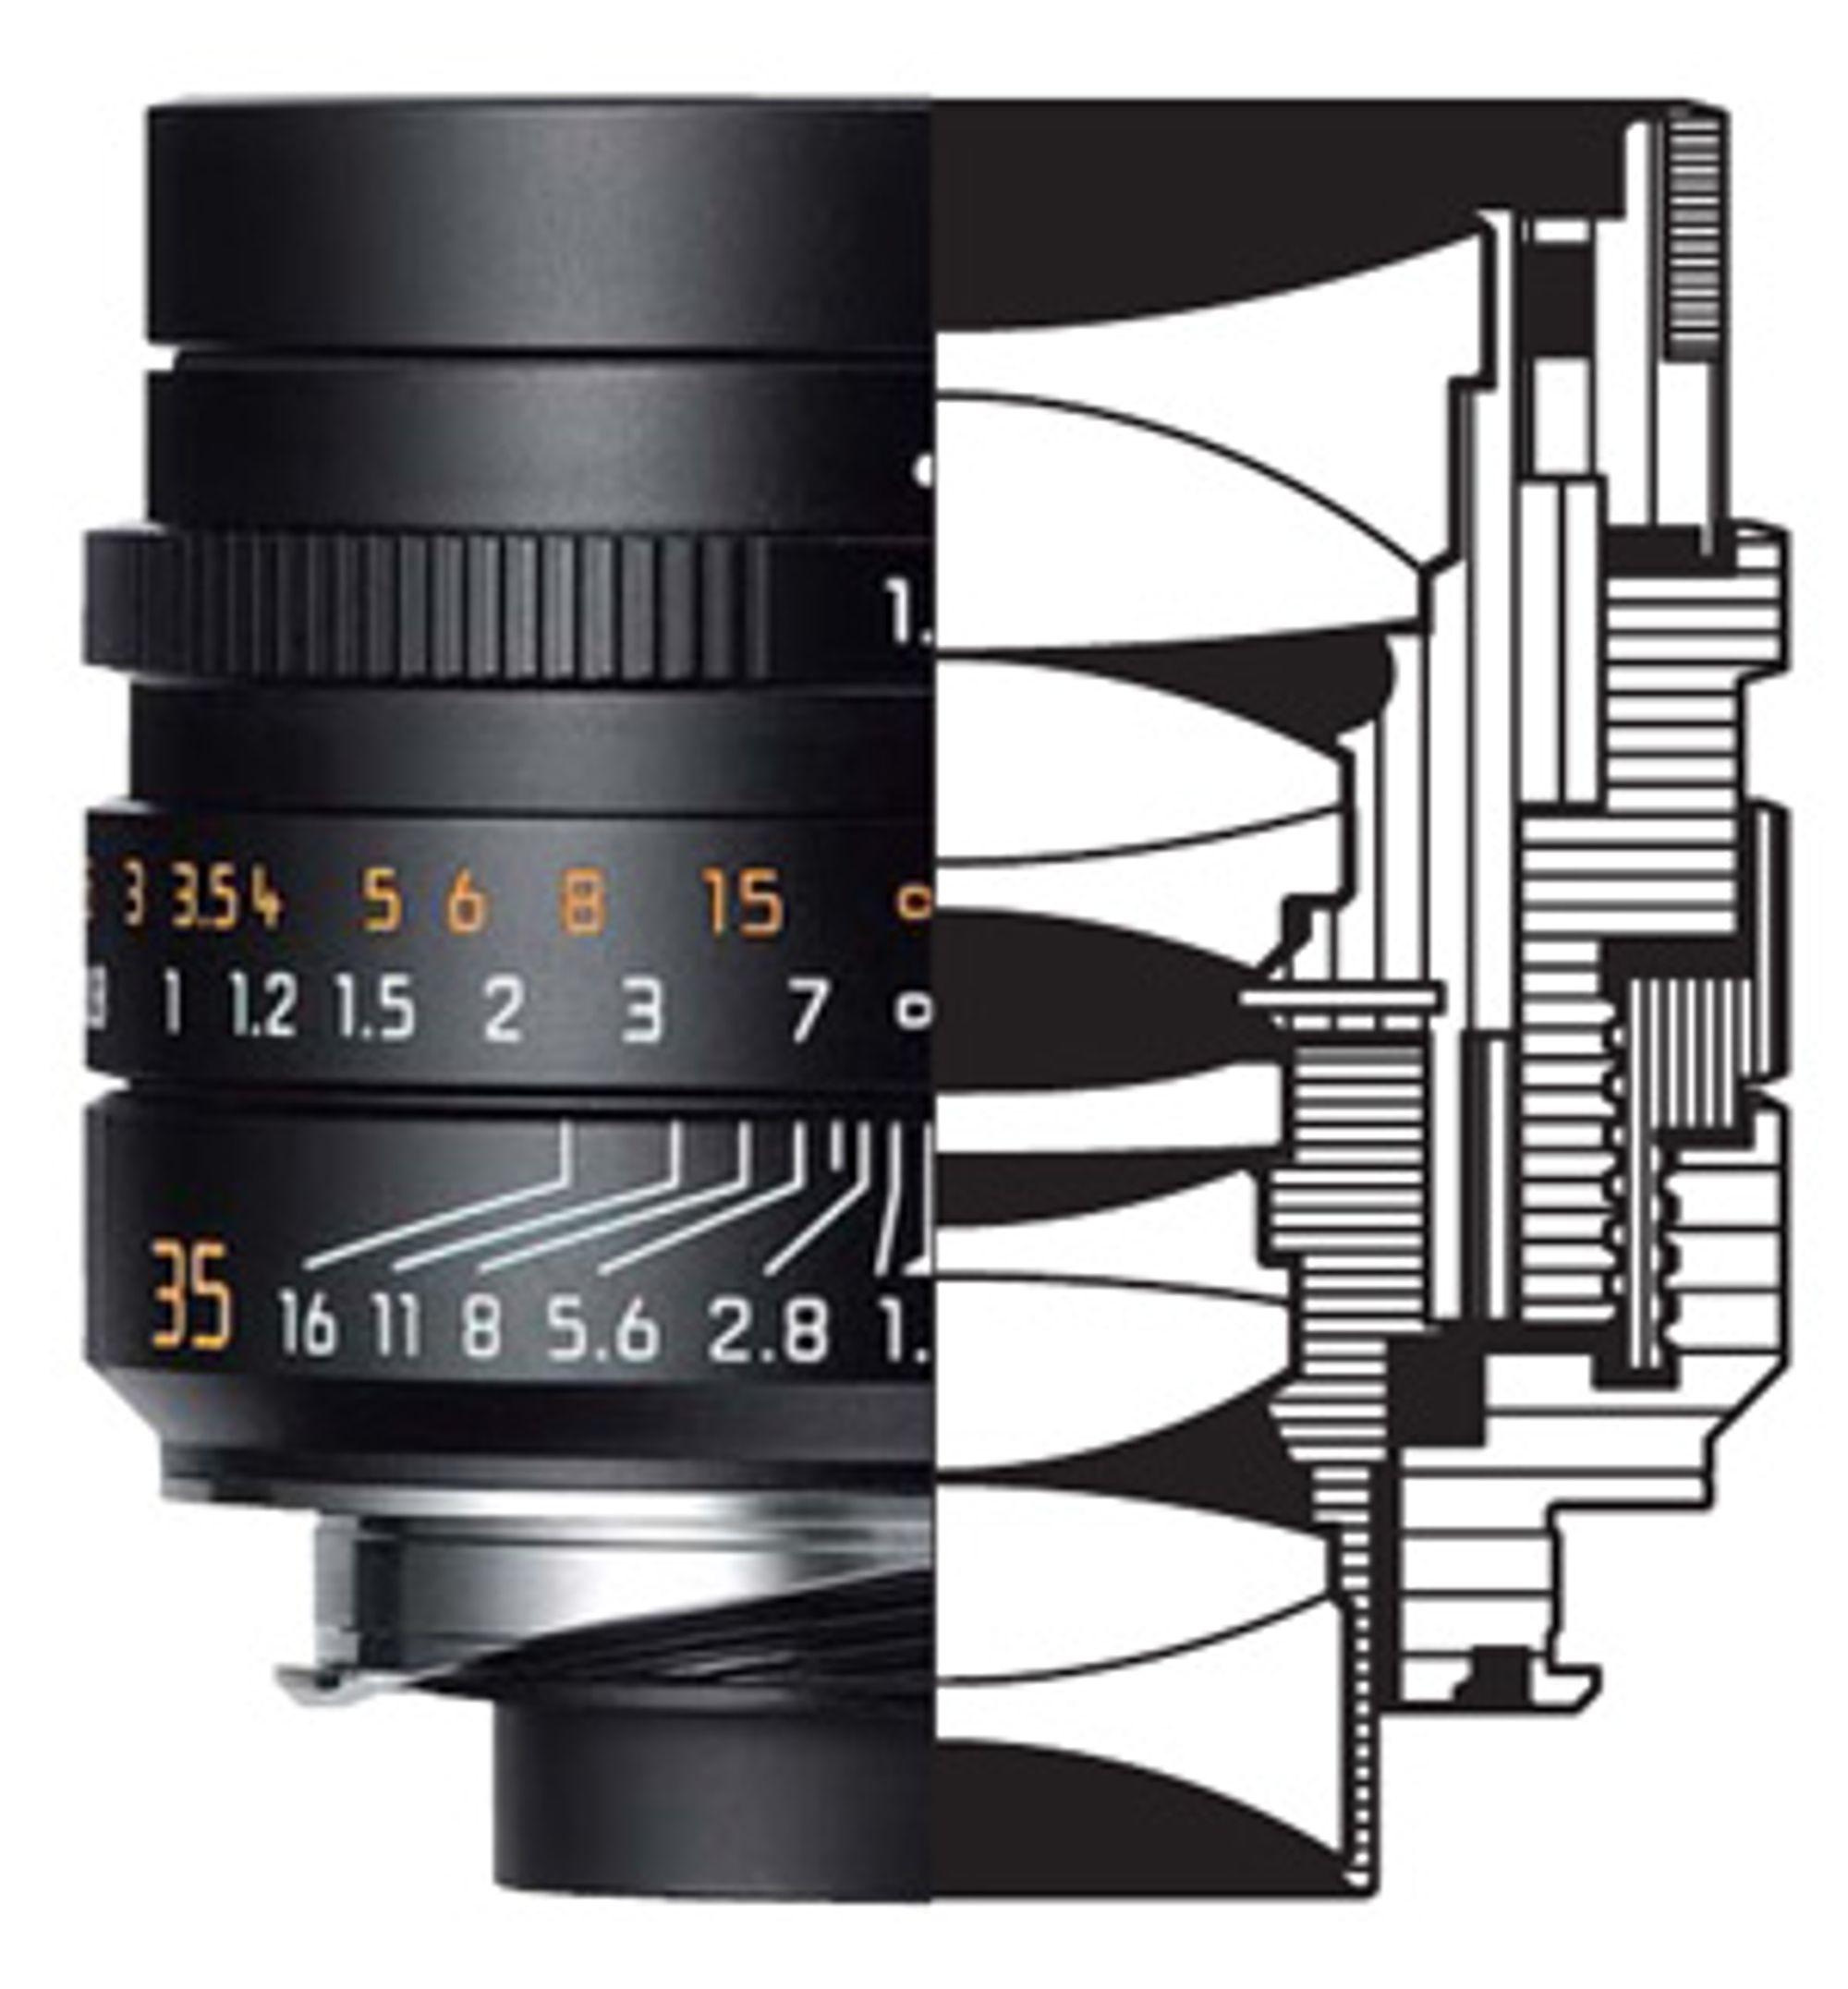 Nye Leica Summilux-M 35mm med ni innvendige linseelementer.